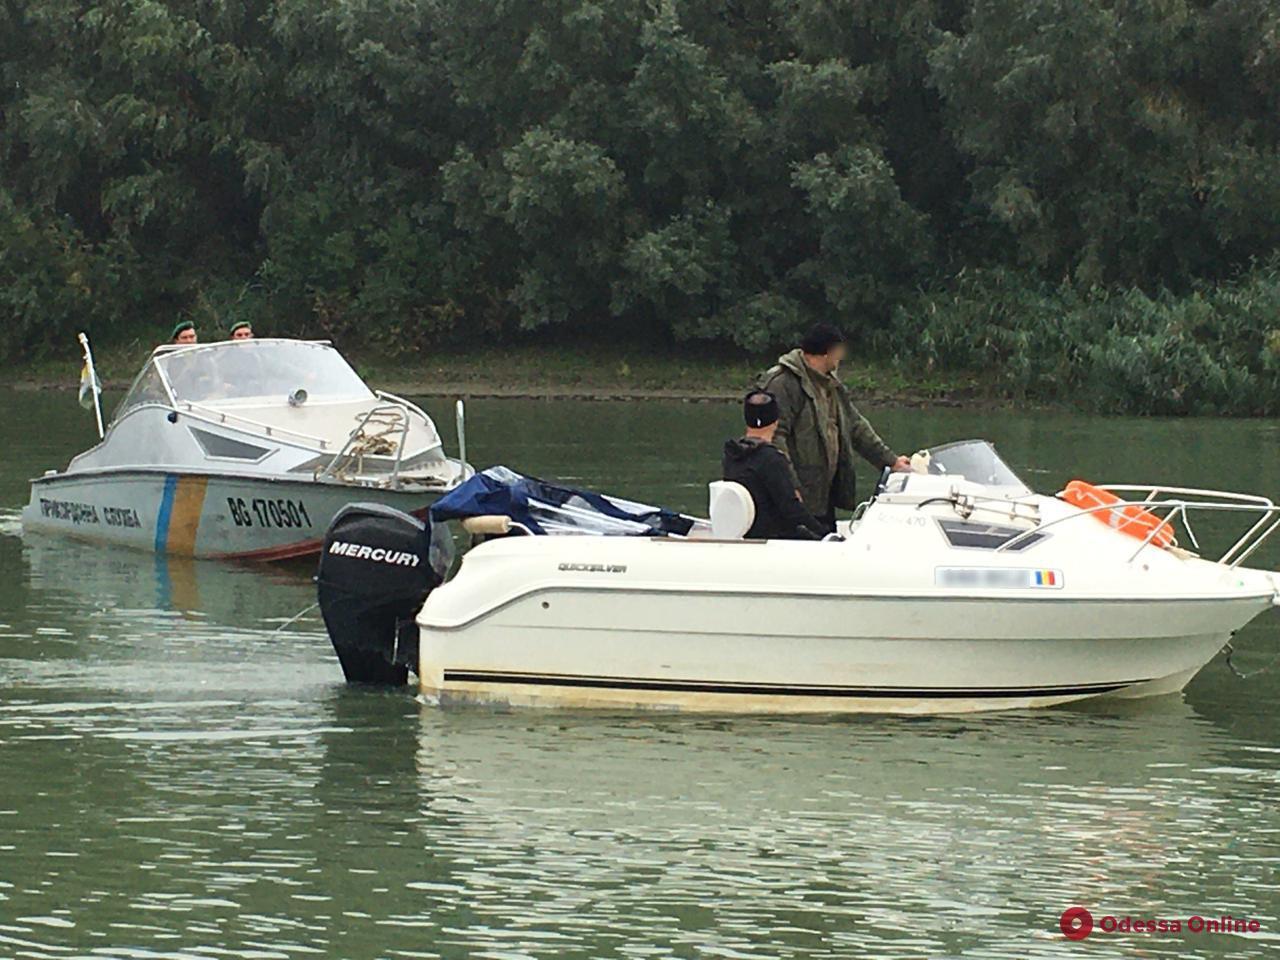 На Дунае пограничники с погоней ловили нелегалов на катере